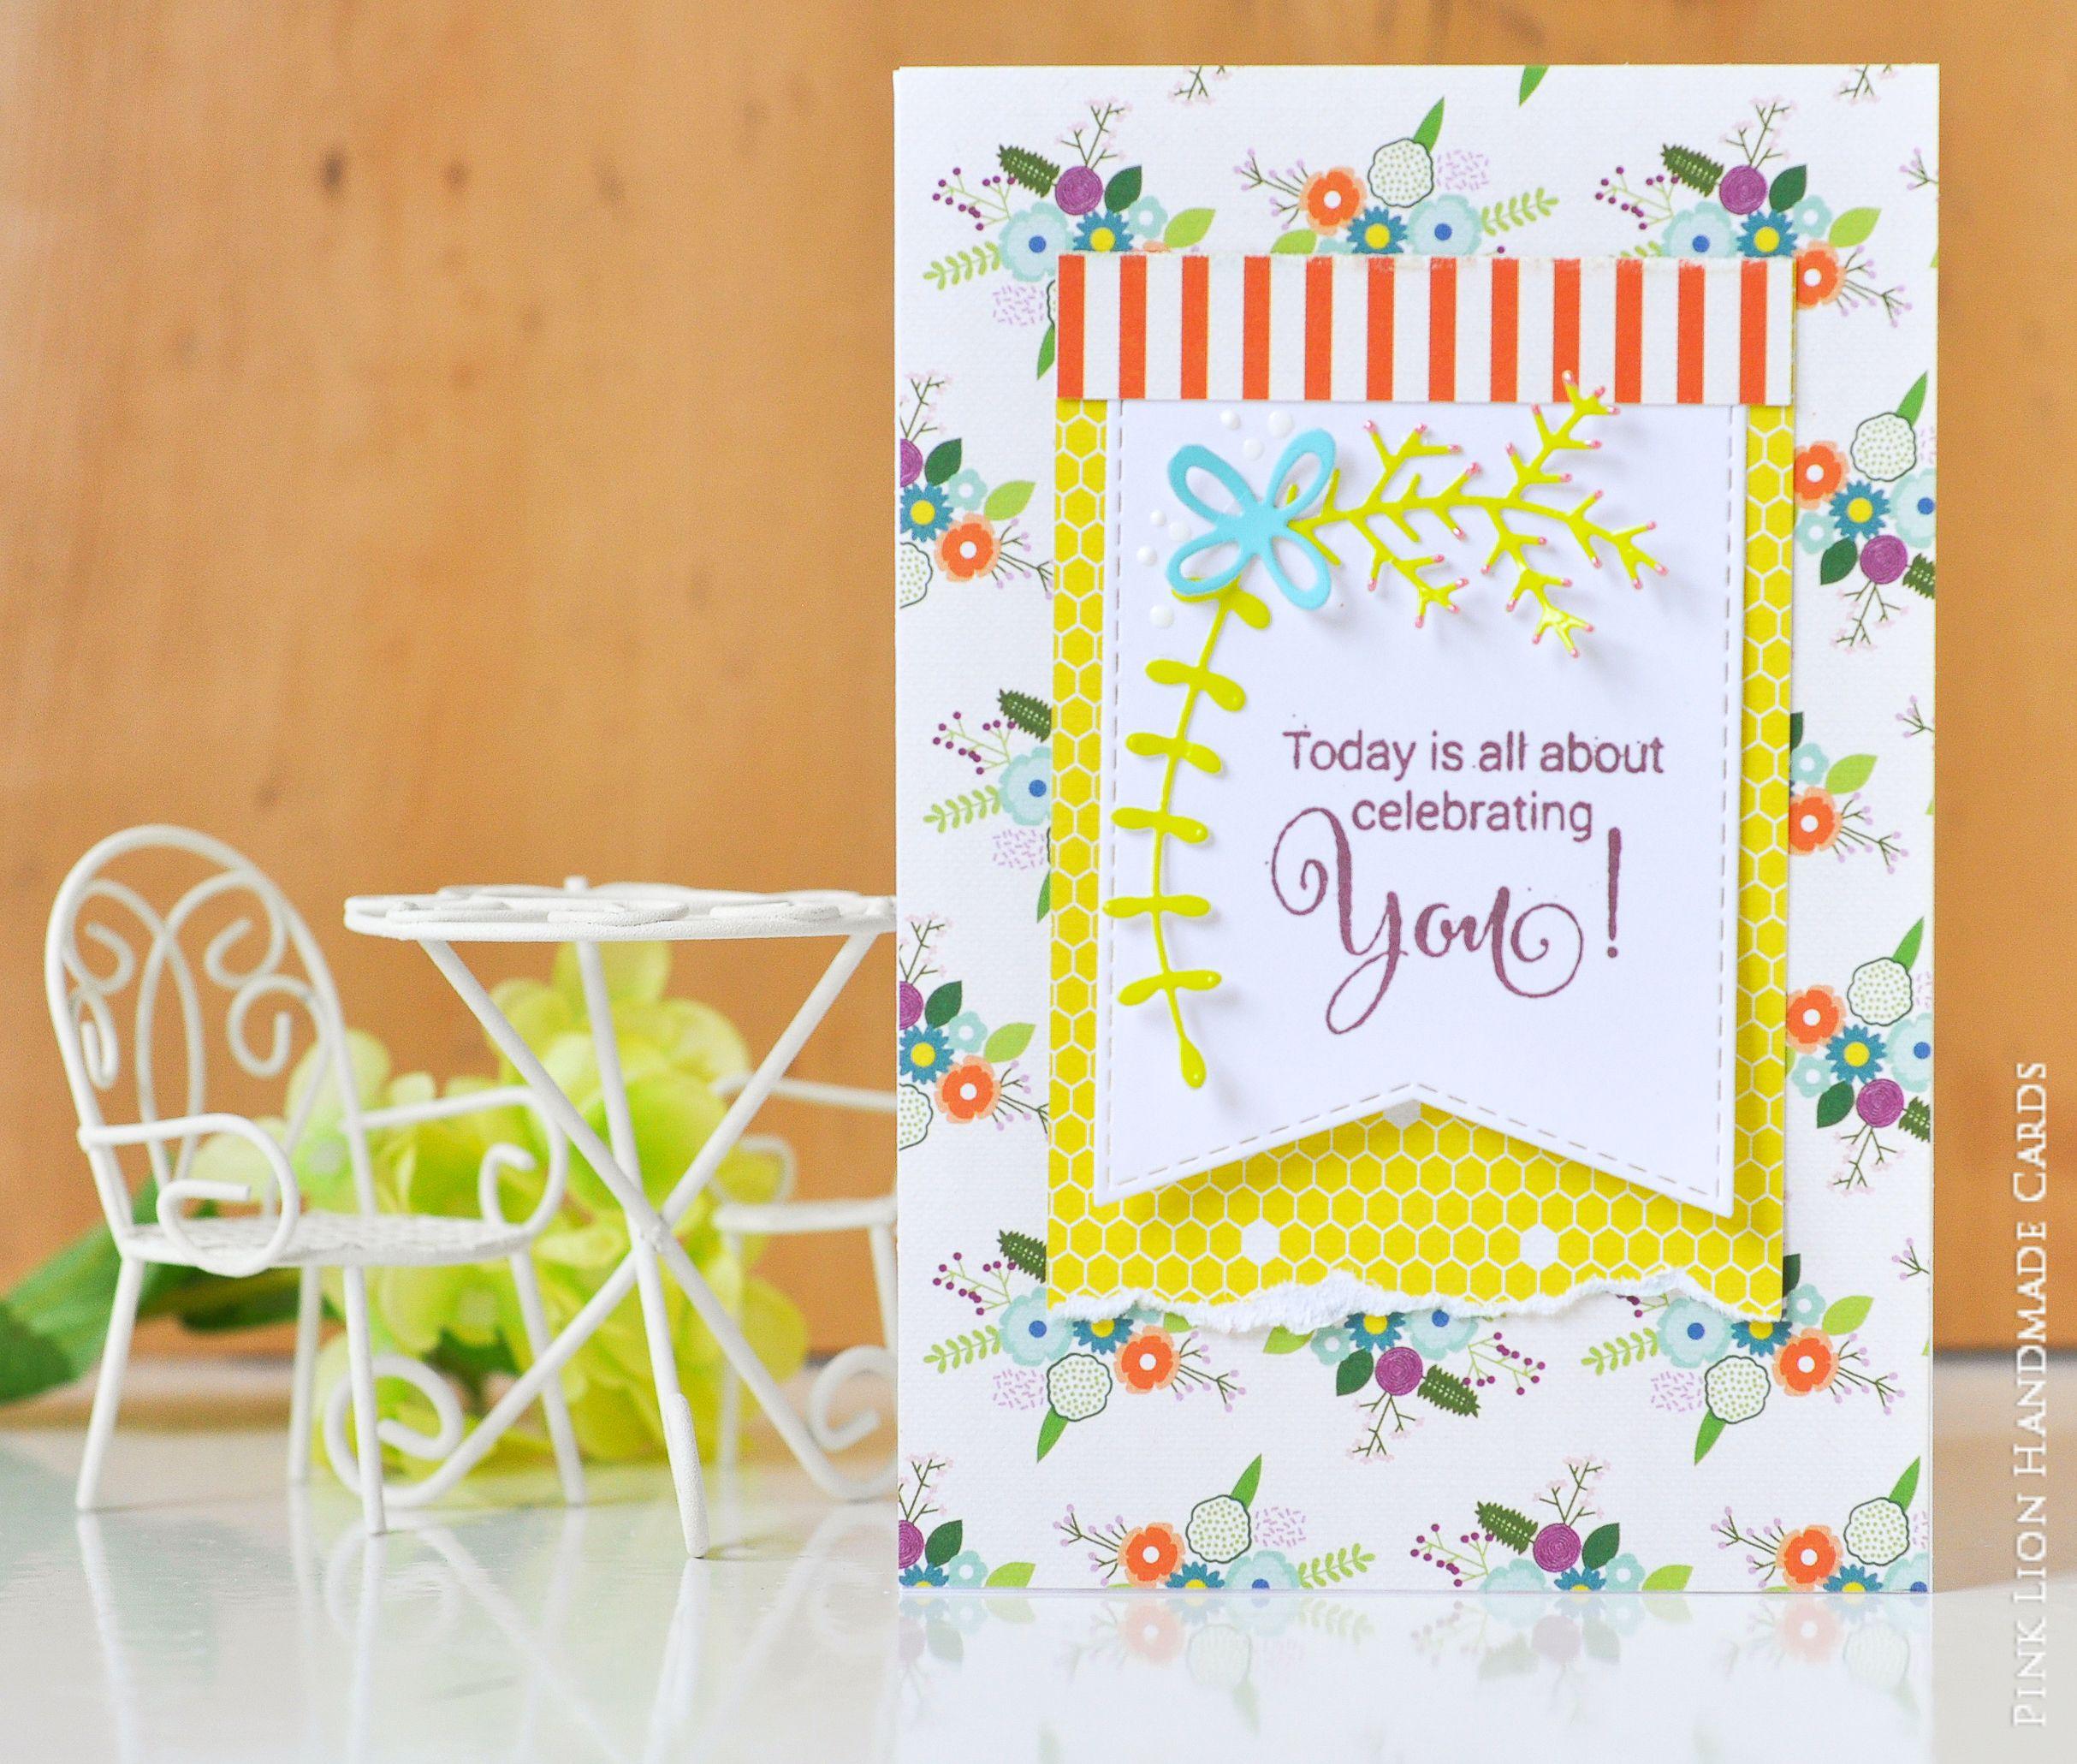 Happy Birthday Celebrate Christian Bible Verse Psalm Handmade Card